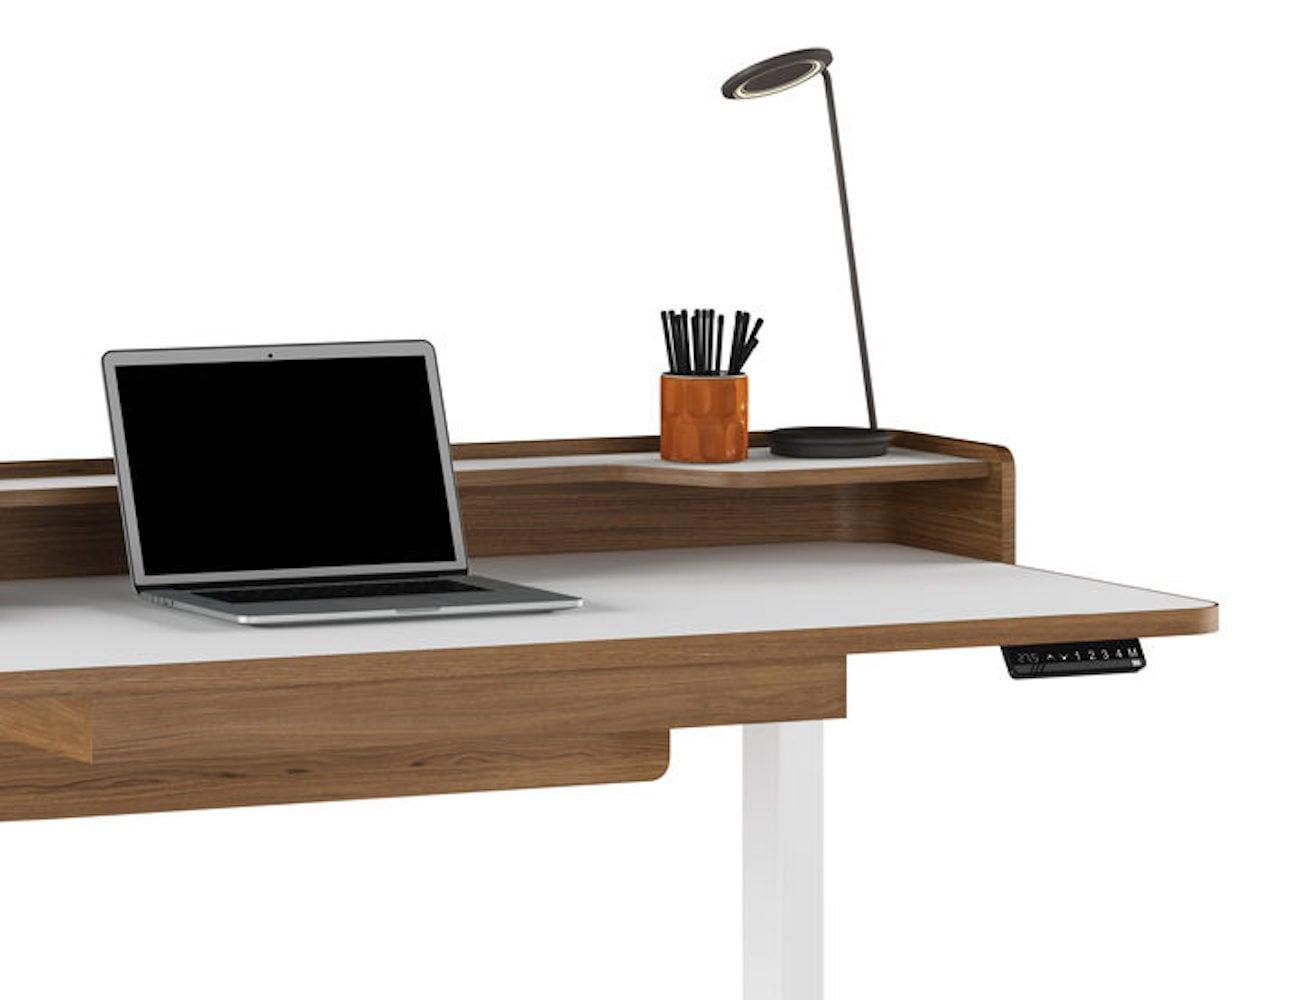 Bdi Furniture Kronos 6752 Lift Standing Desk Gadget Flow